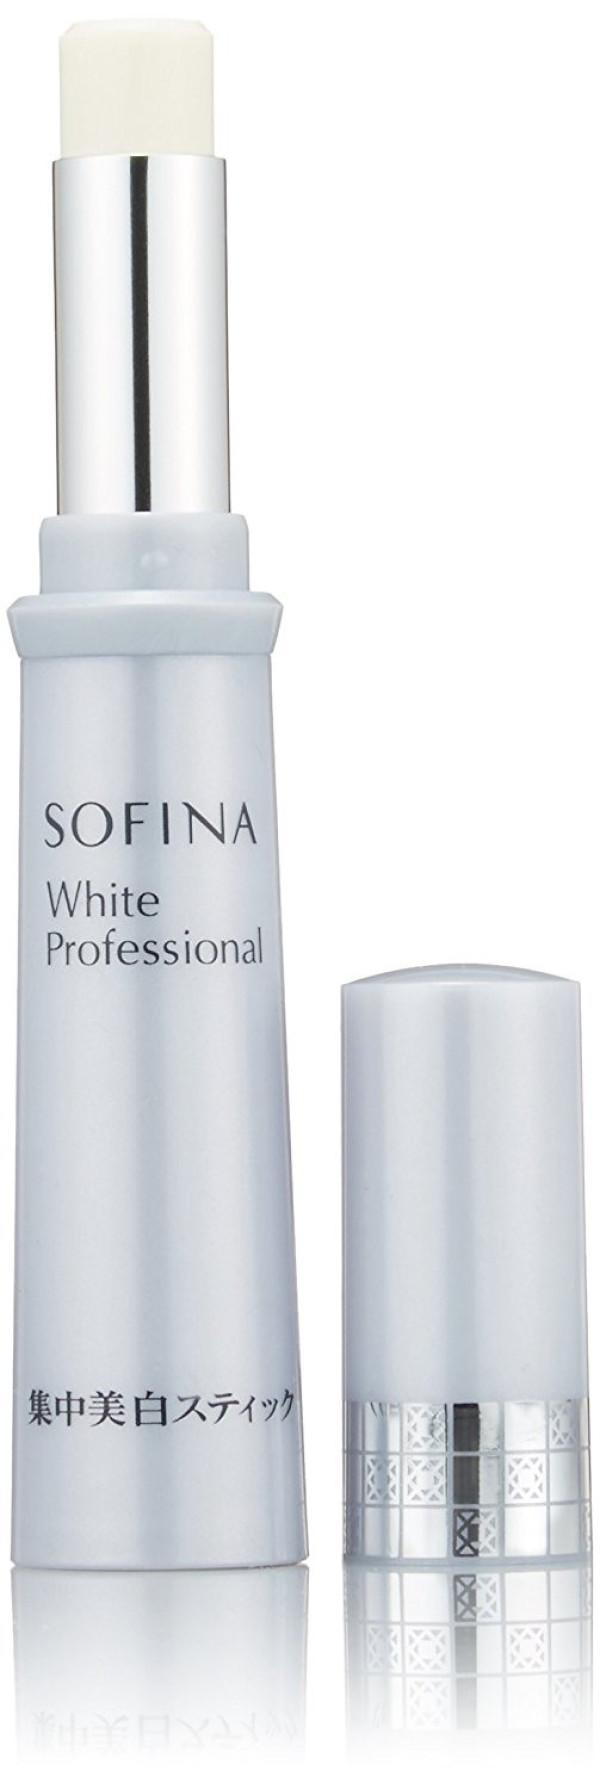 Отбеливающий карандаш Sofina White Professional